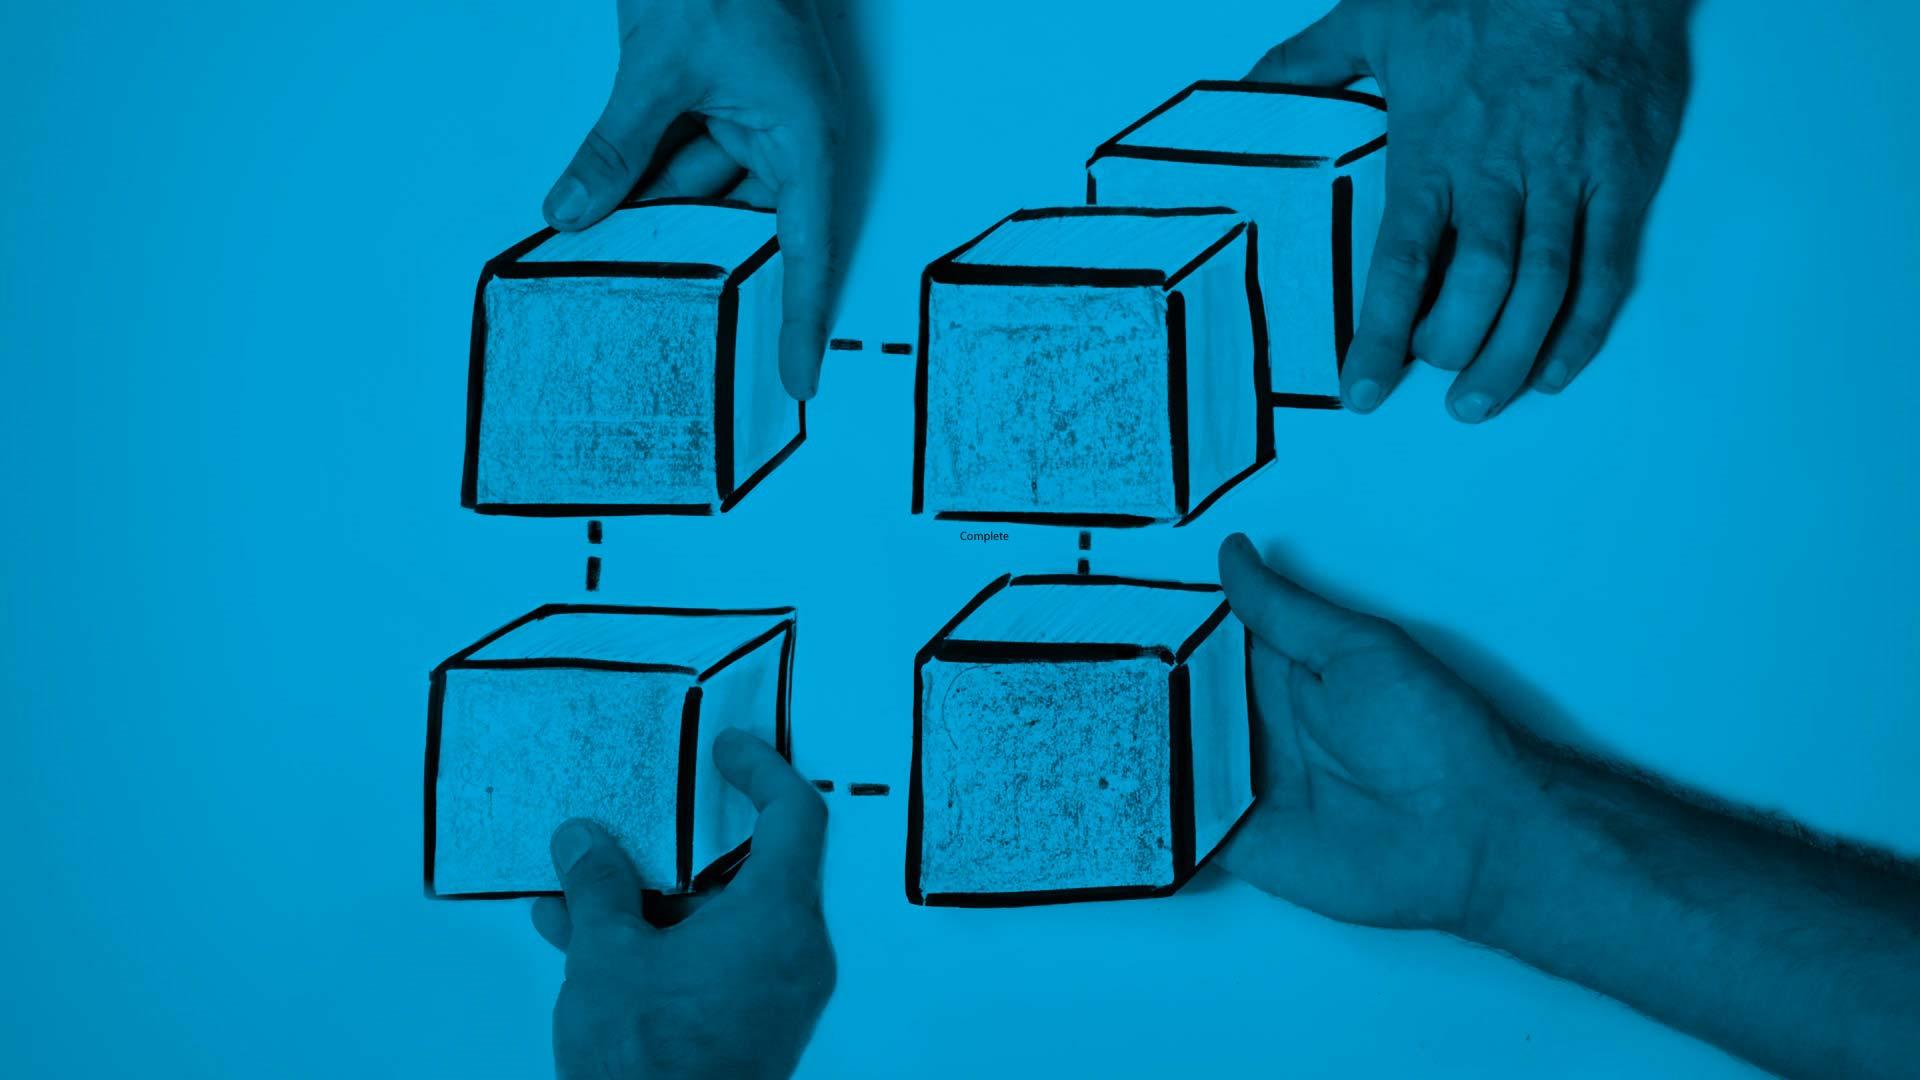 blog_Glaser_open connect cubes_blue overlay